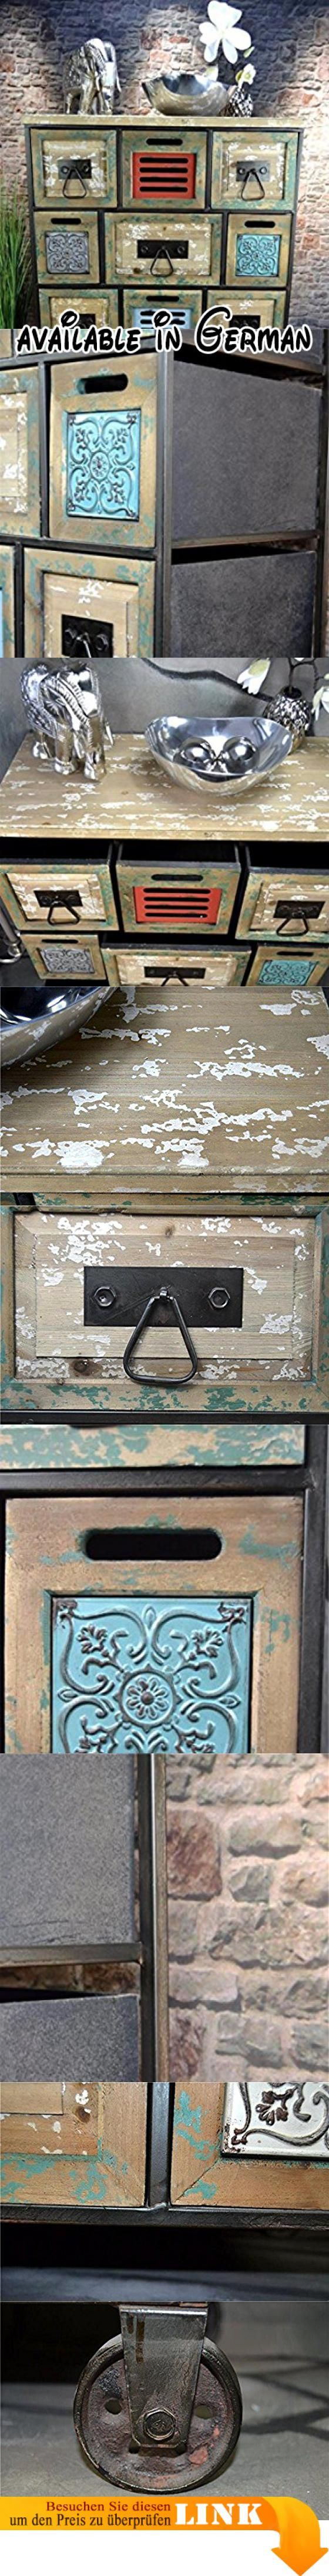 B074FVHQMQ : Livitat Sideboard Kommode Metall 100 x 76 cm Vintage ...